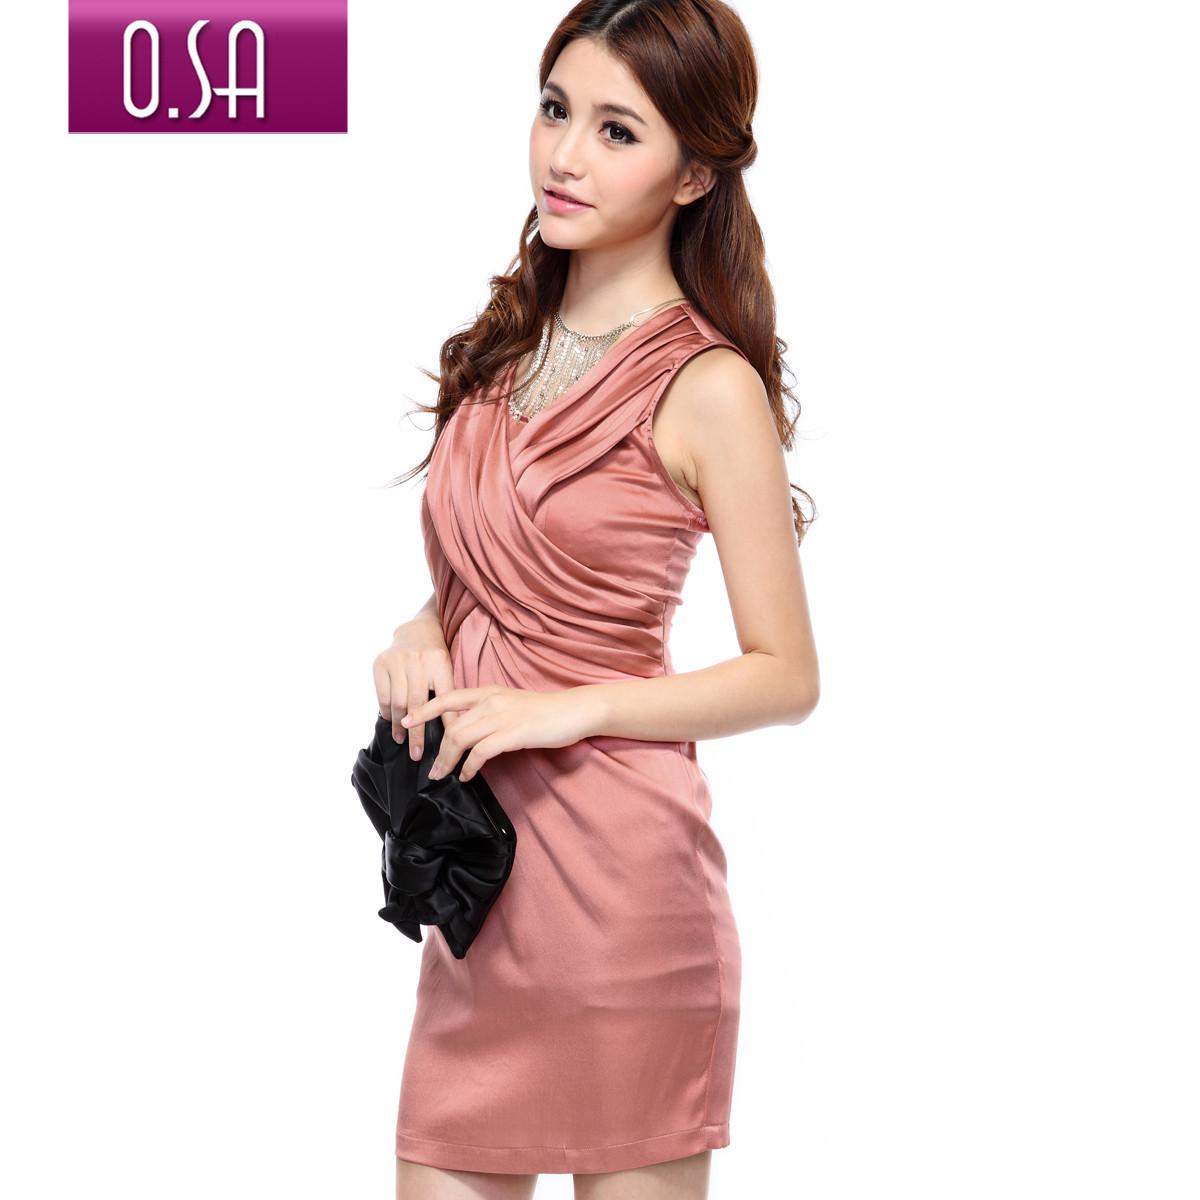 Женское платье OSA sl23125 O.SA 2012 L23125